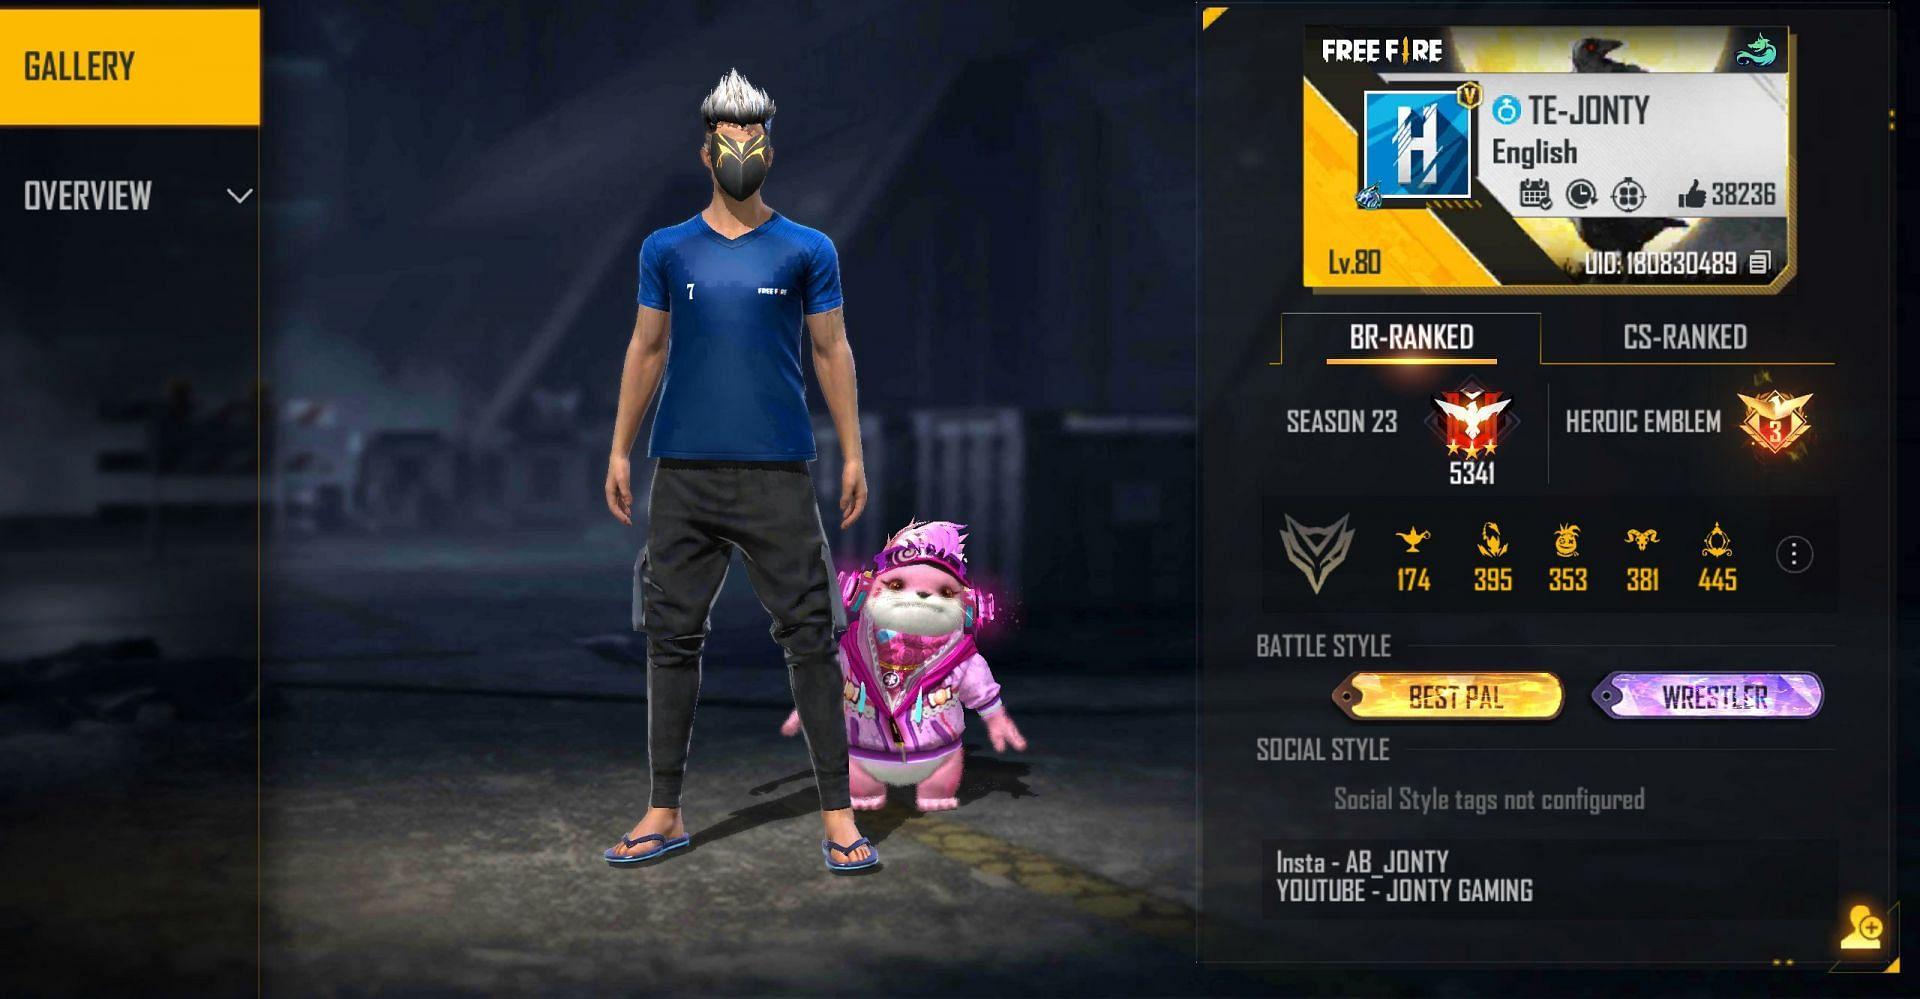 Jonty Gaming represents Team Elite (Image via Free Fire)